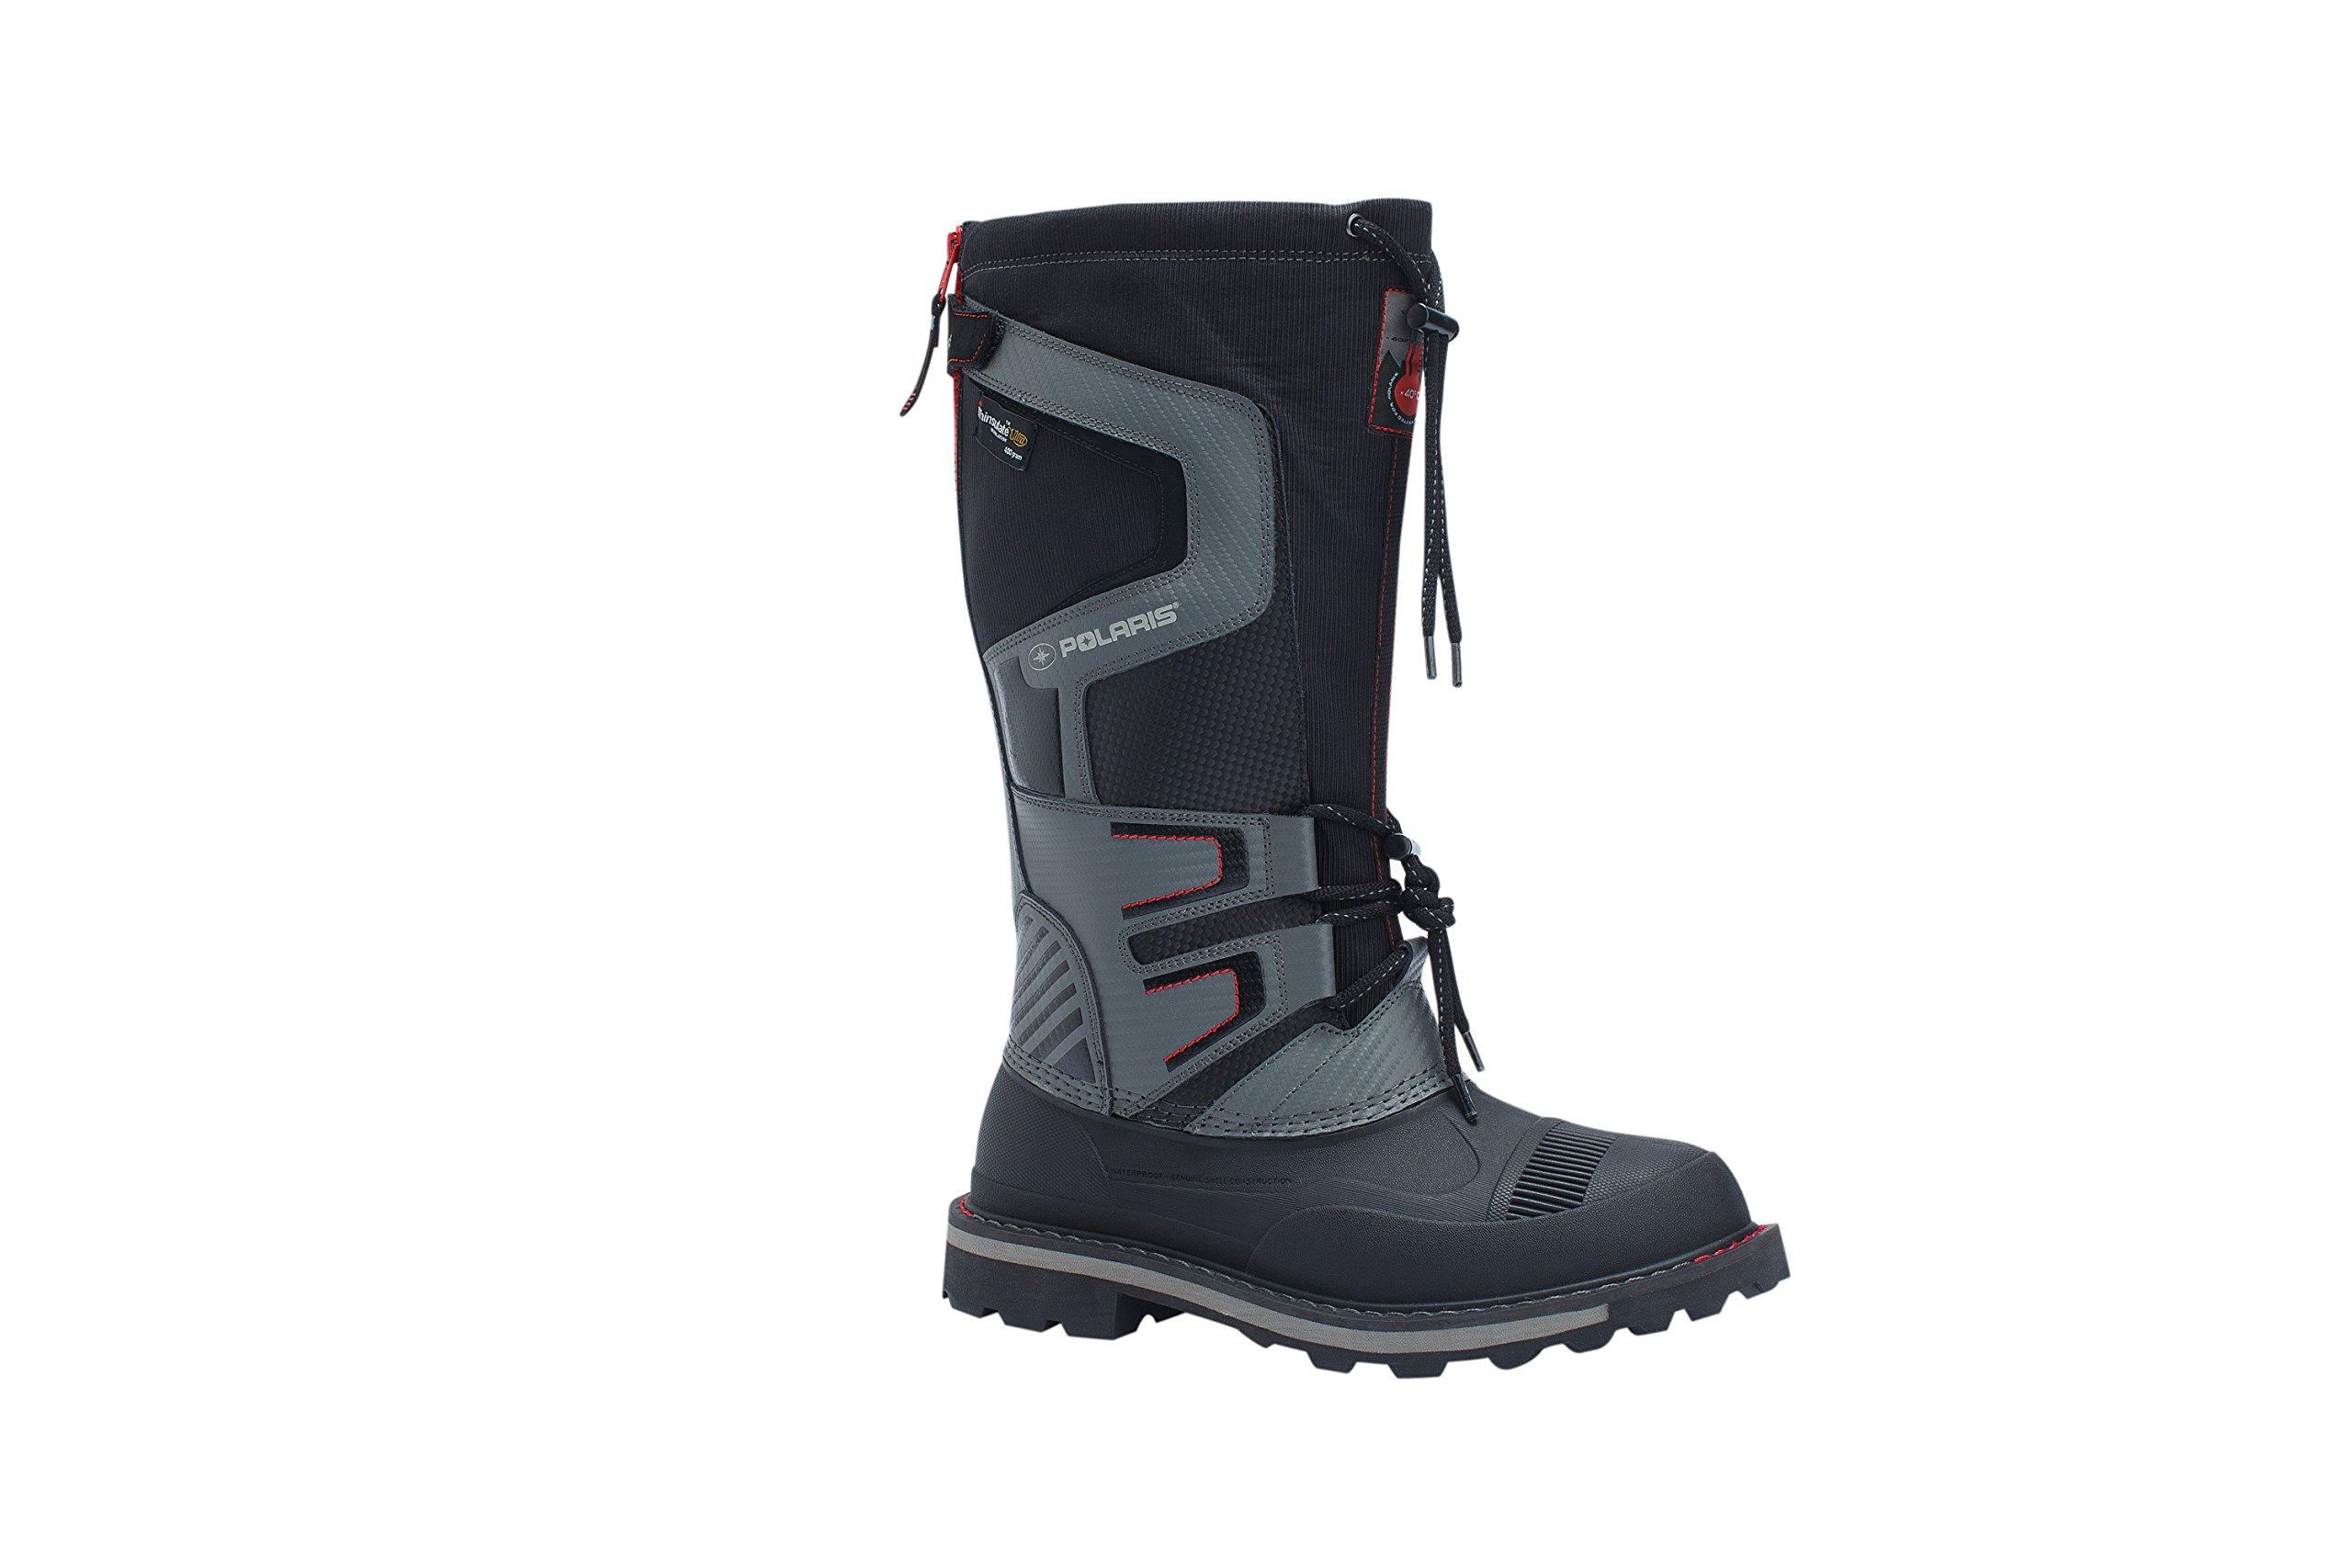 Polaris Men's Drift Master Waterproof Cold Weather Boot, Black, 10.5